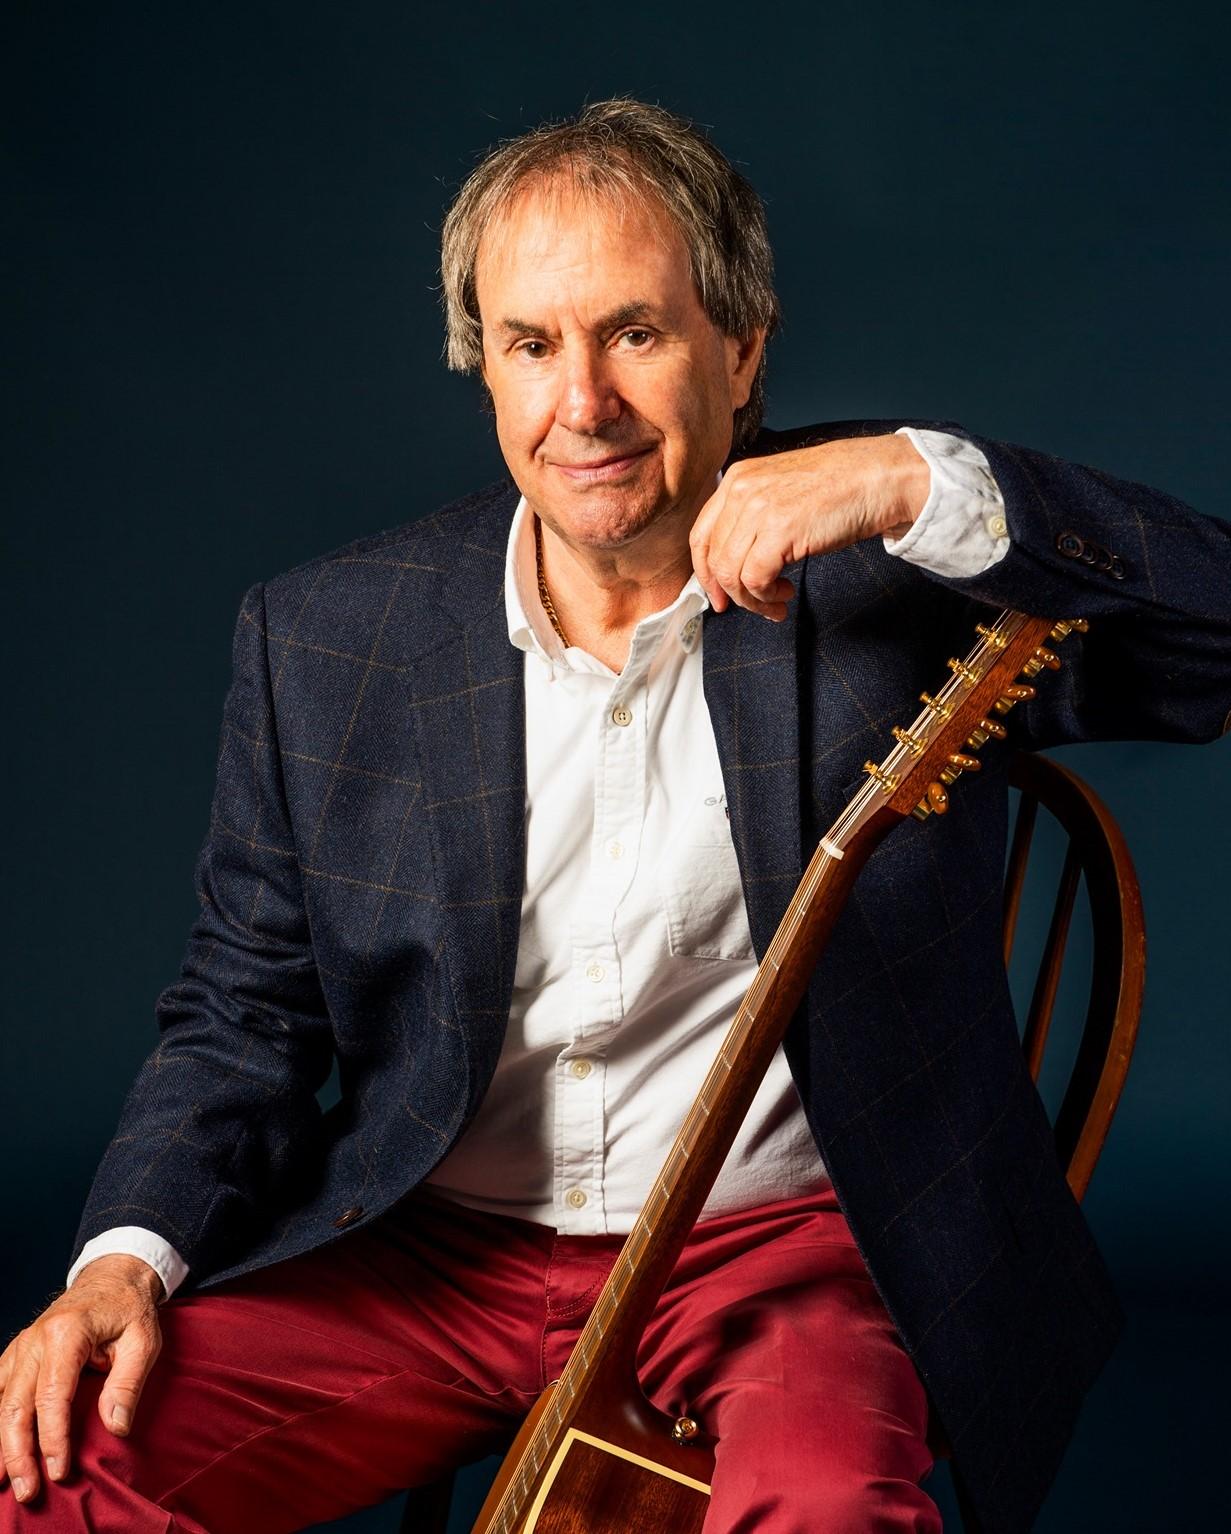 Chris de Burgh – The Legend of Robin Hood, 13.11.2021, Lokhalle Göttingen